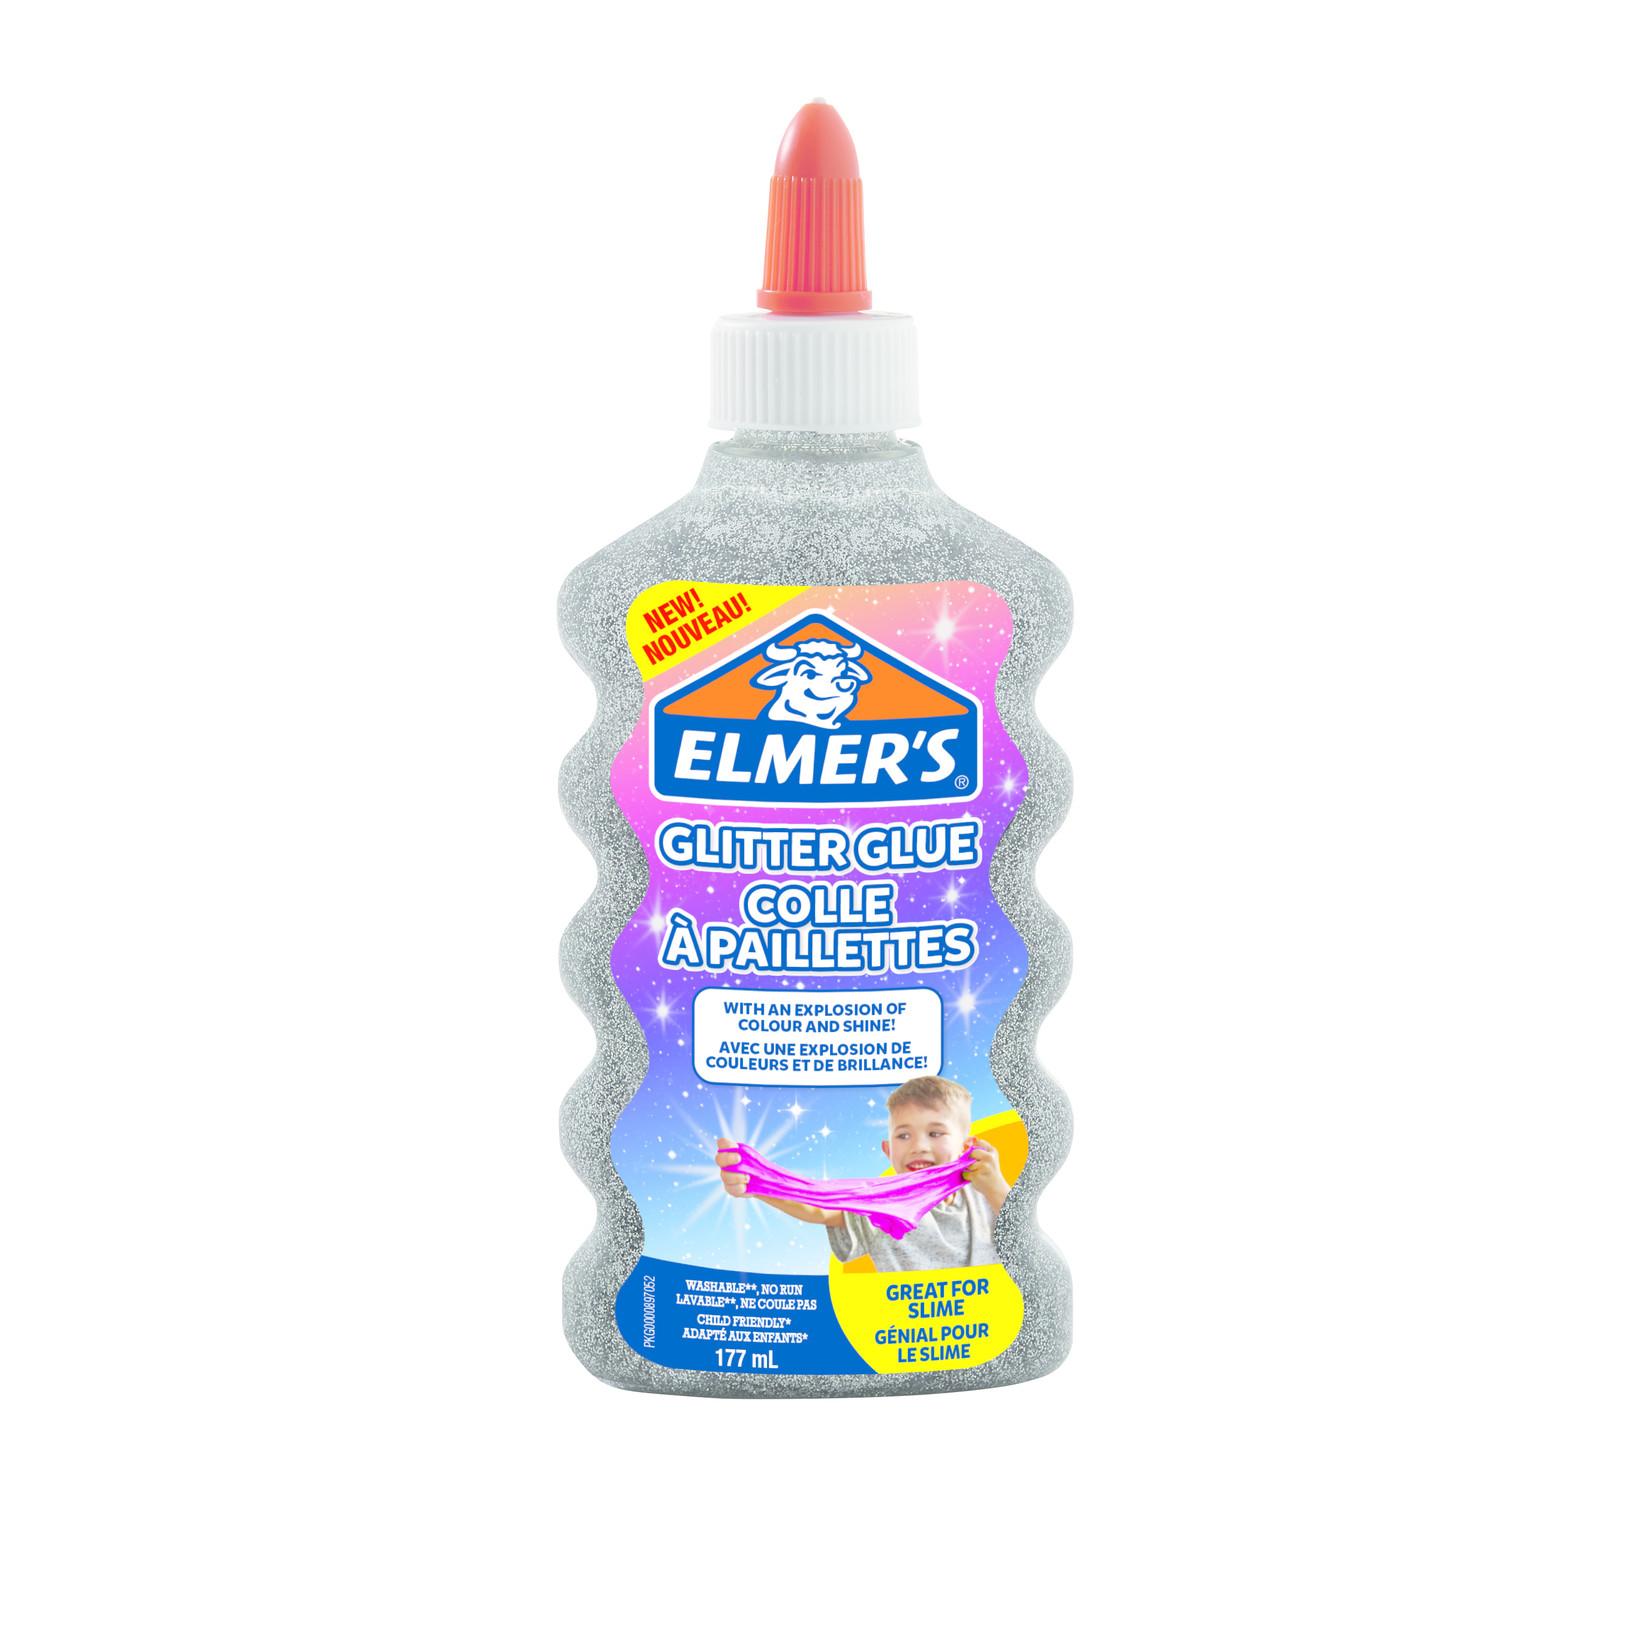 NWL Austria GmbH Elmers Glitter Glue silber